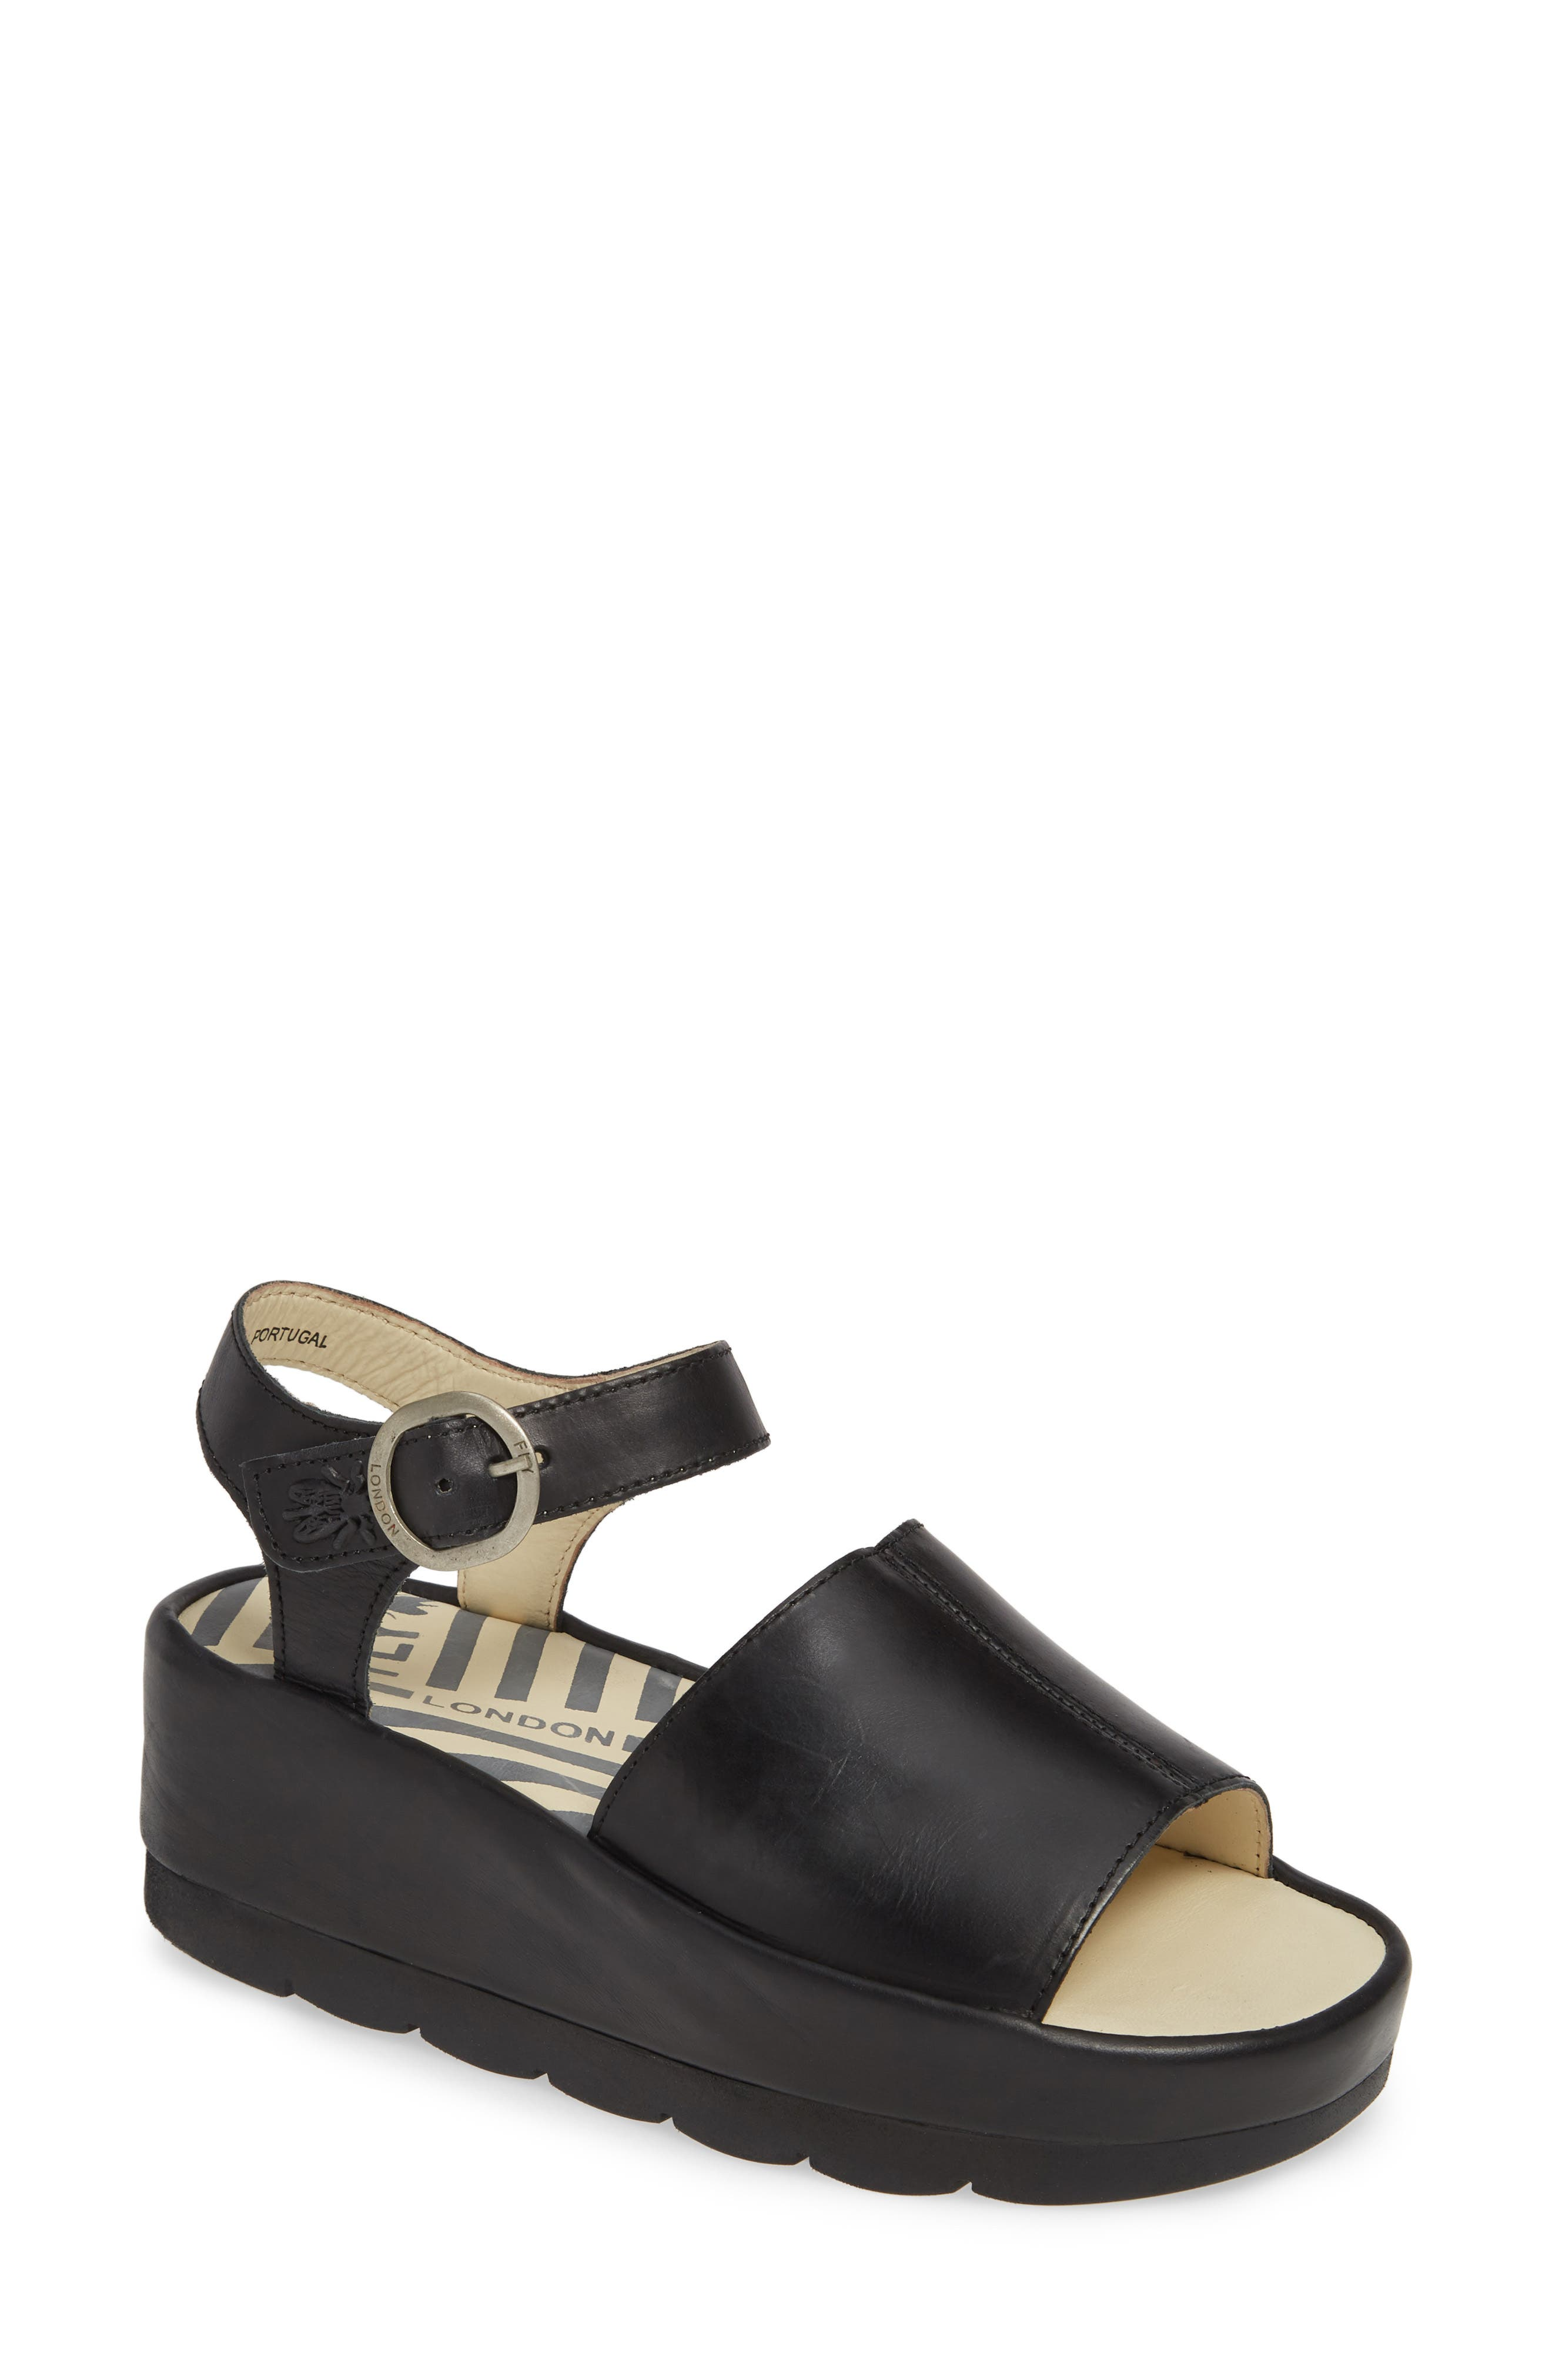 FLY LONDON, Bano Platform Sandal, Main thumbnail 1, color, BLACK LEATHER